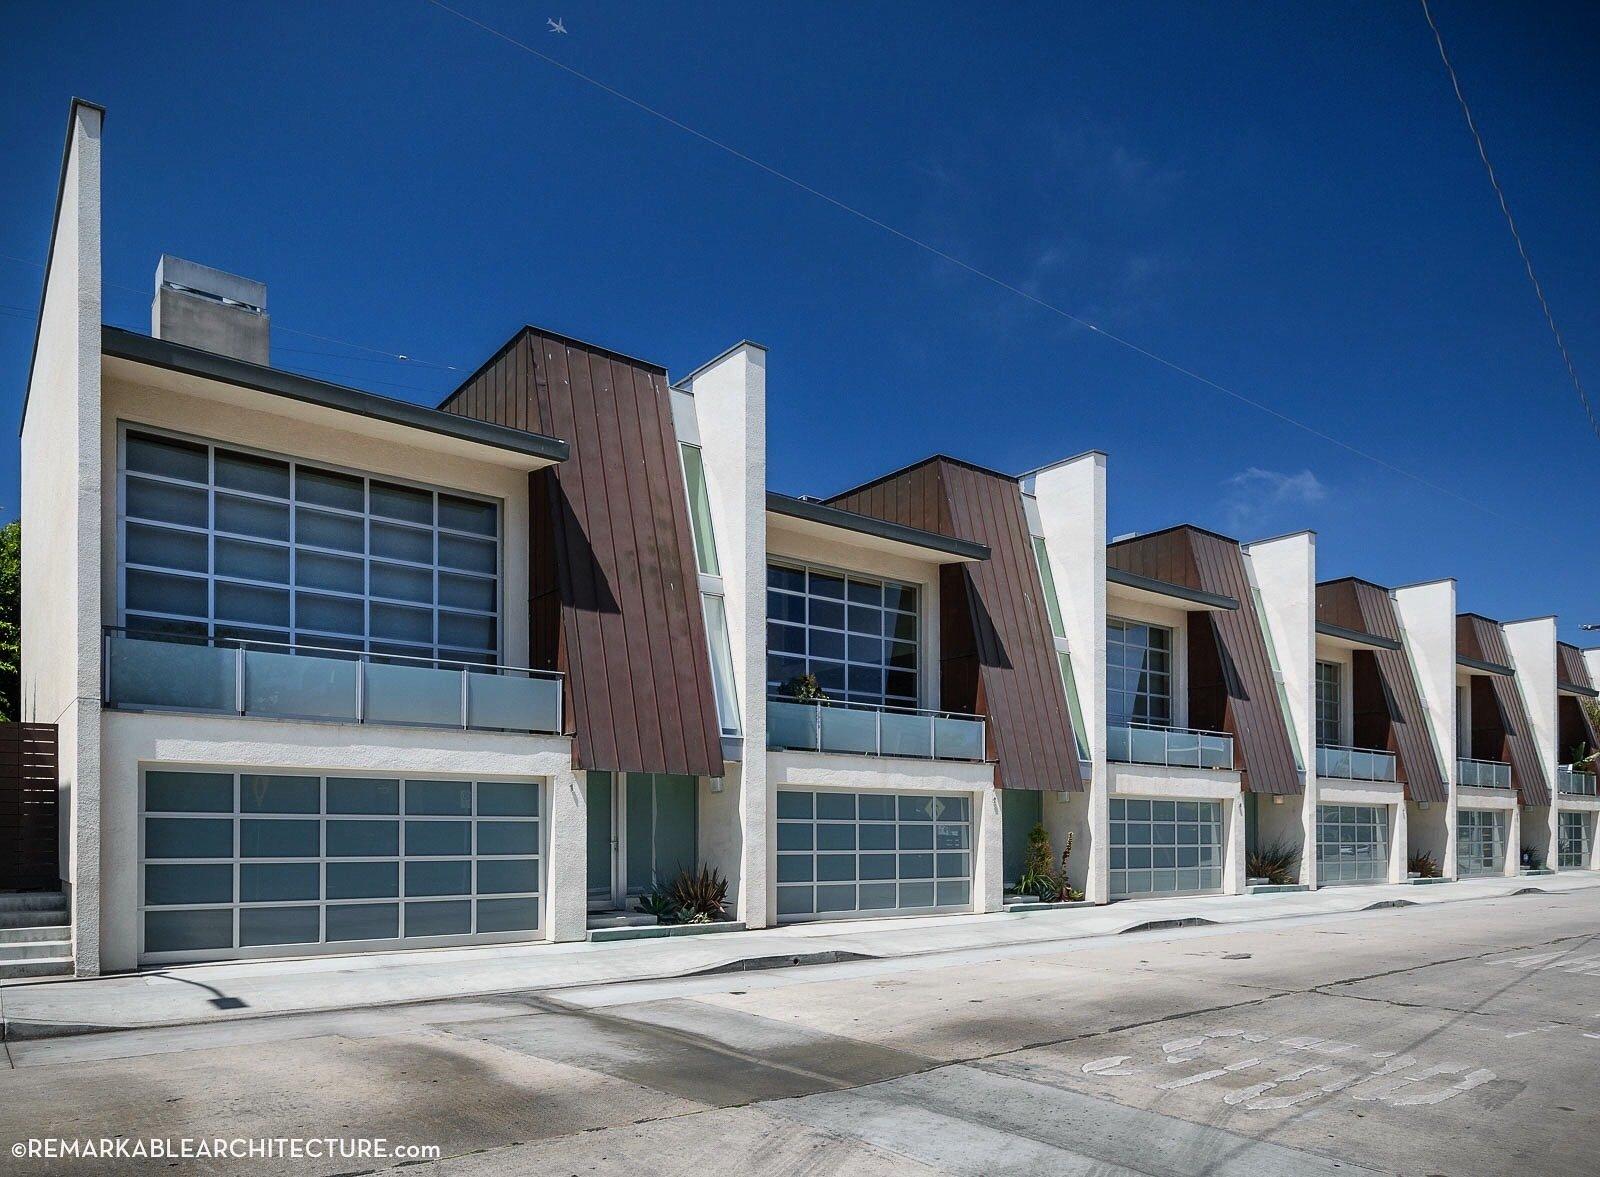 Minimalist Postmodern Mansardplex (with split-level garage).  There is no 'I' in Archetect